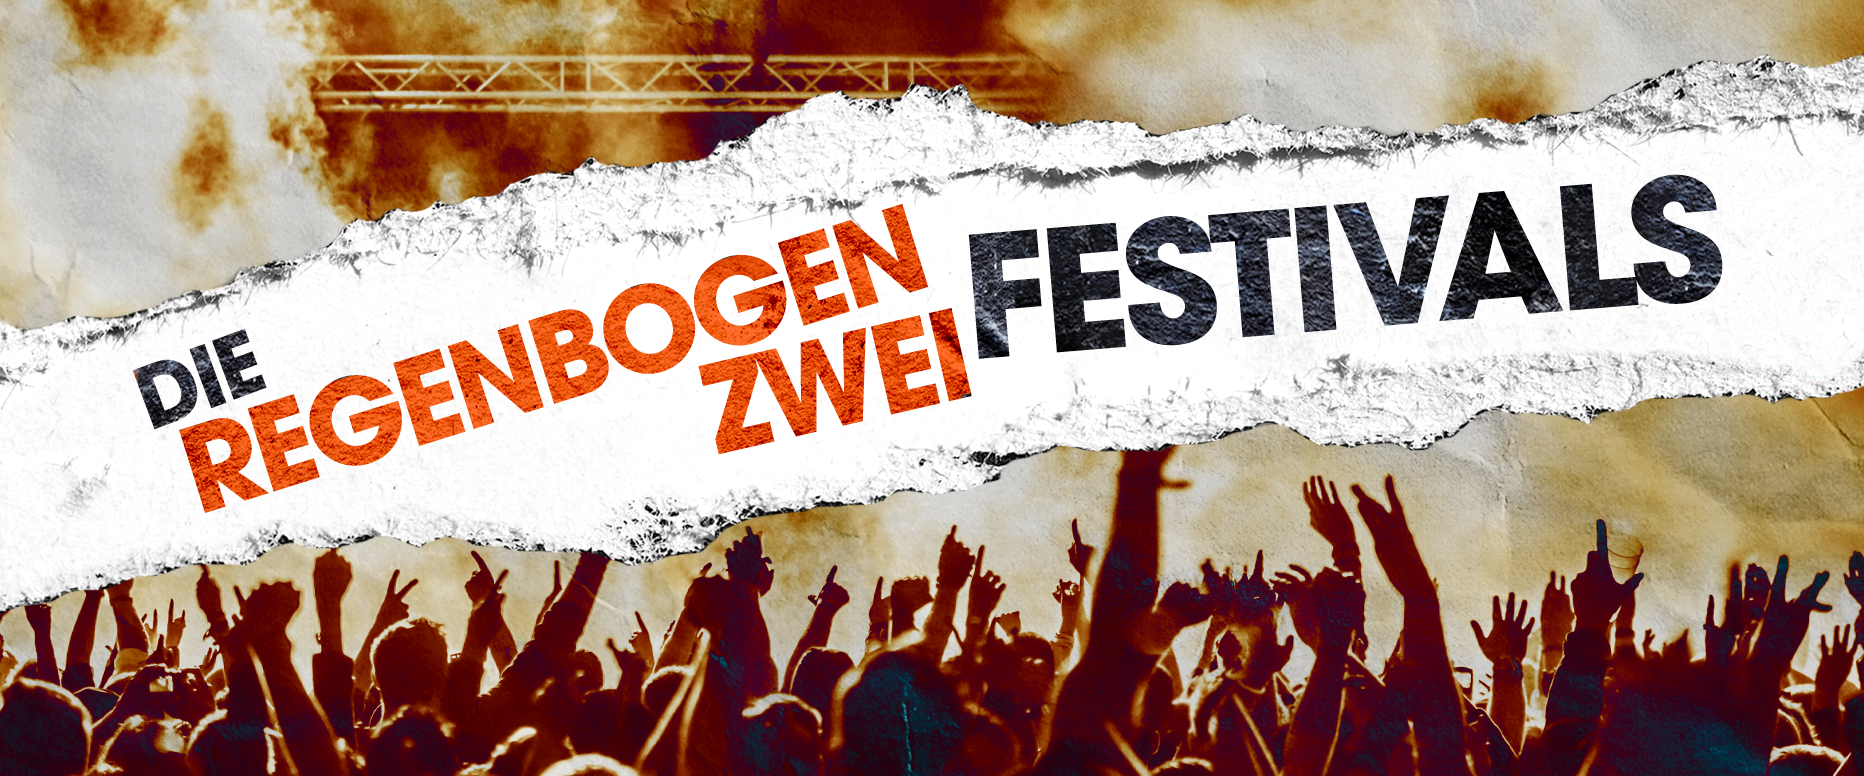 R2-Festivals-Titel.png